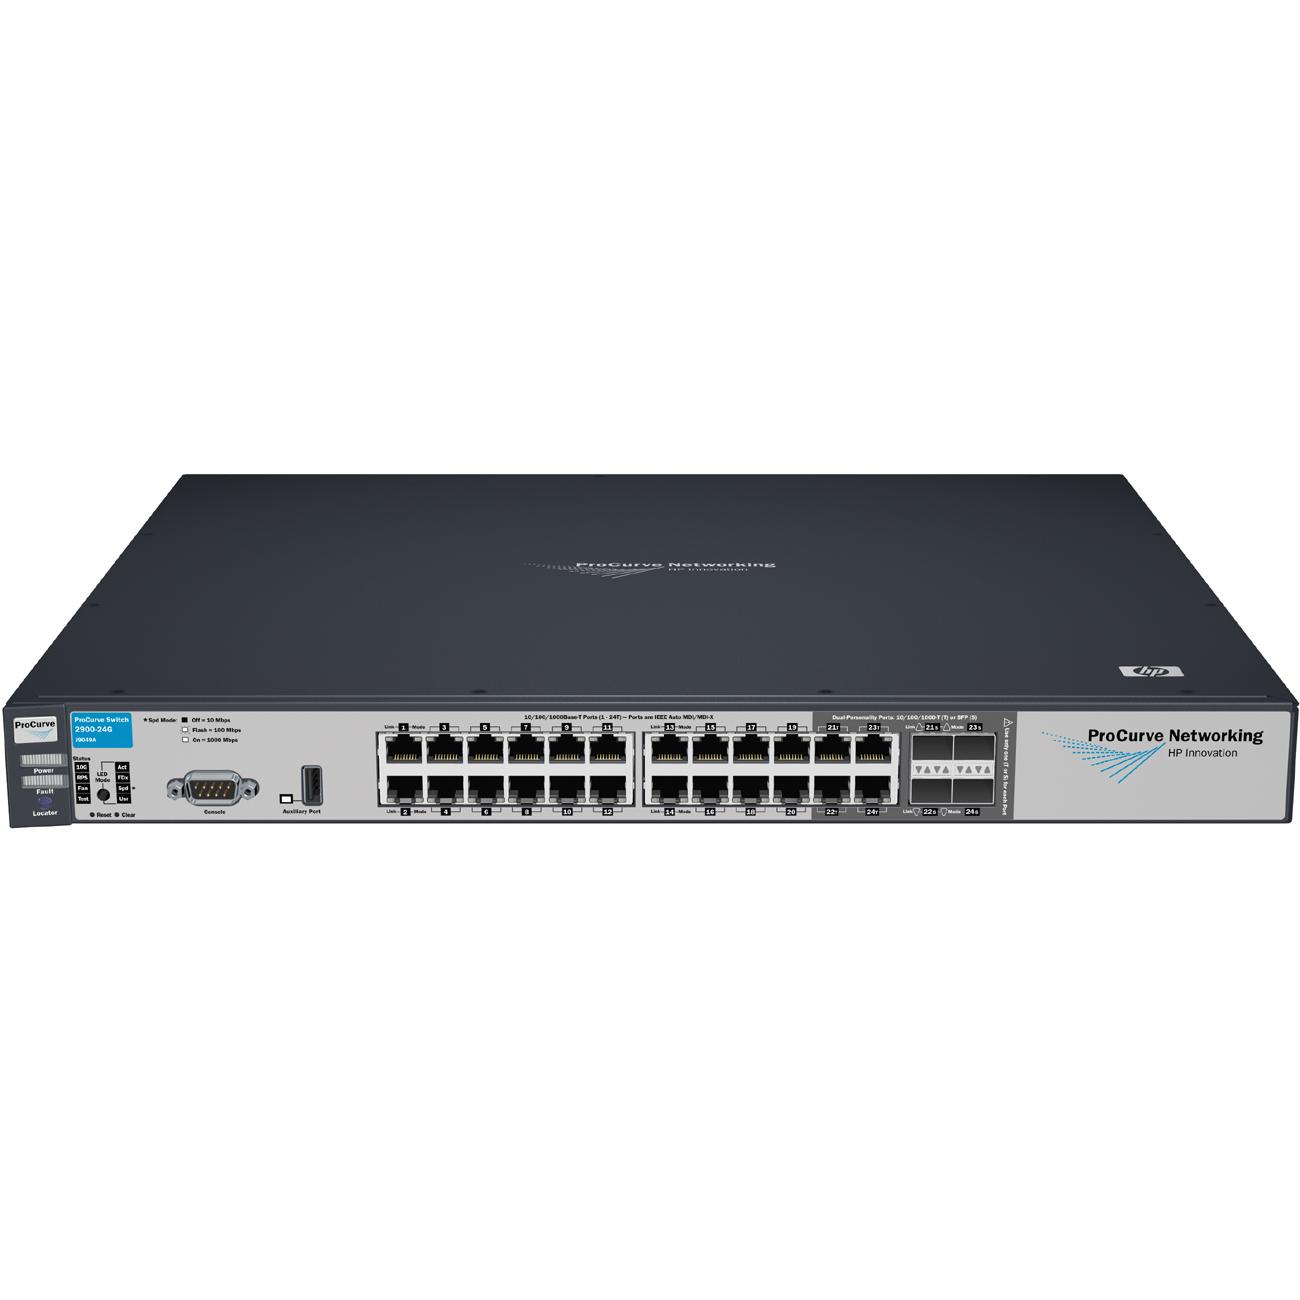 Ict Hardware It Distributors Europe Hp Procurve 1800 8g Switch Pn J9029a